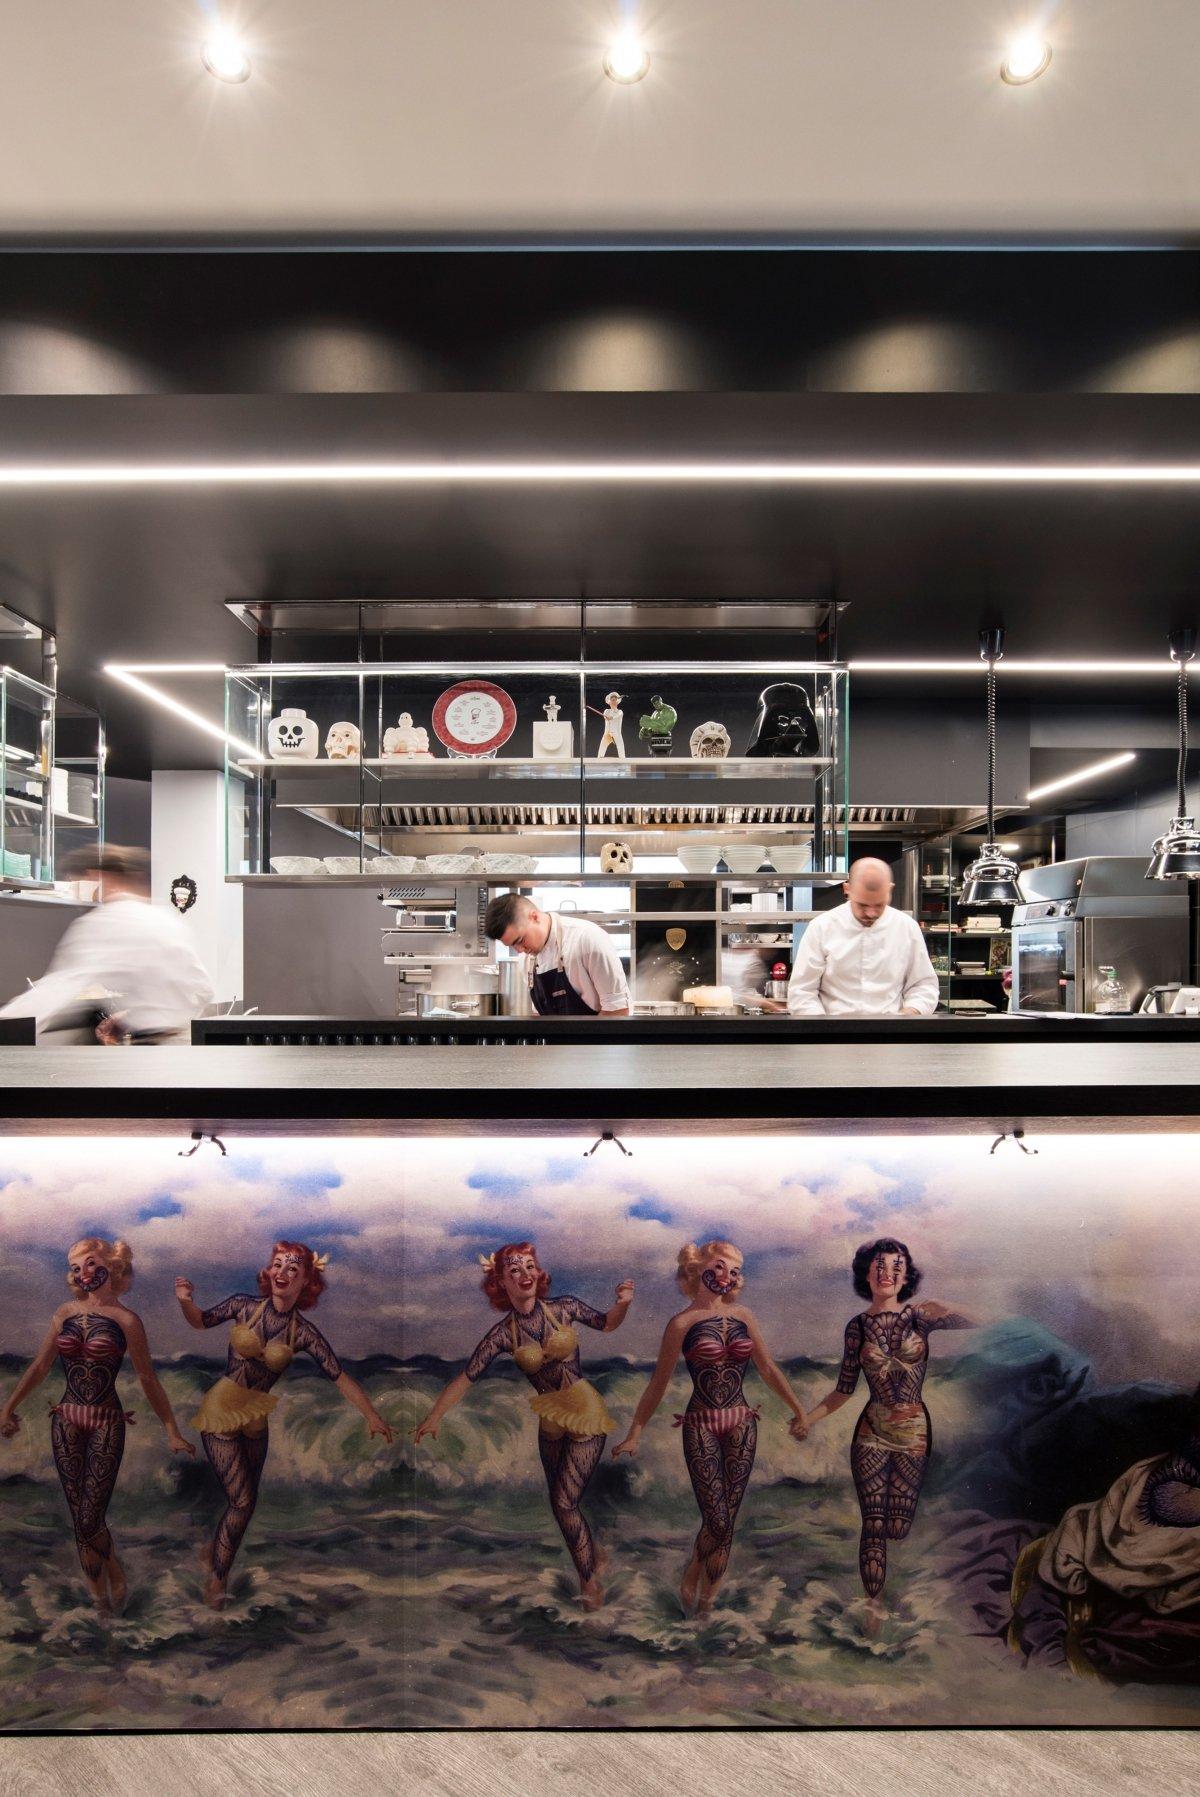 Vista de la cocina a la vista del restaurante Tatau Bistró